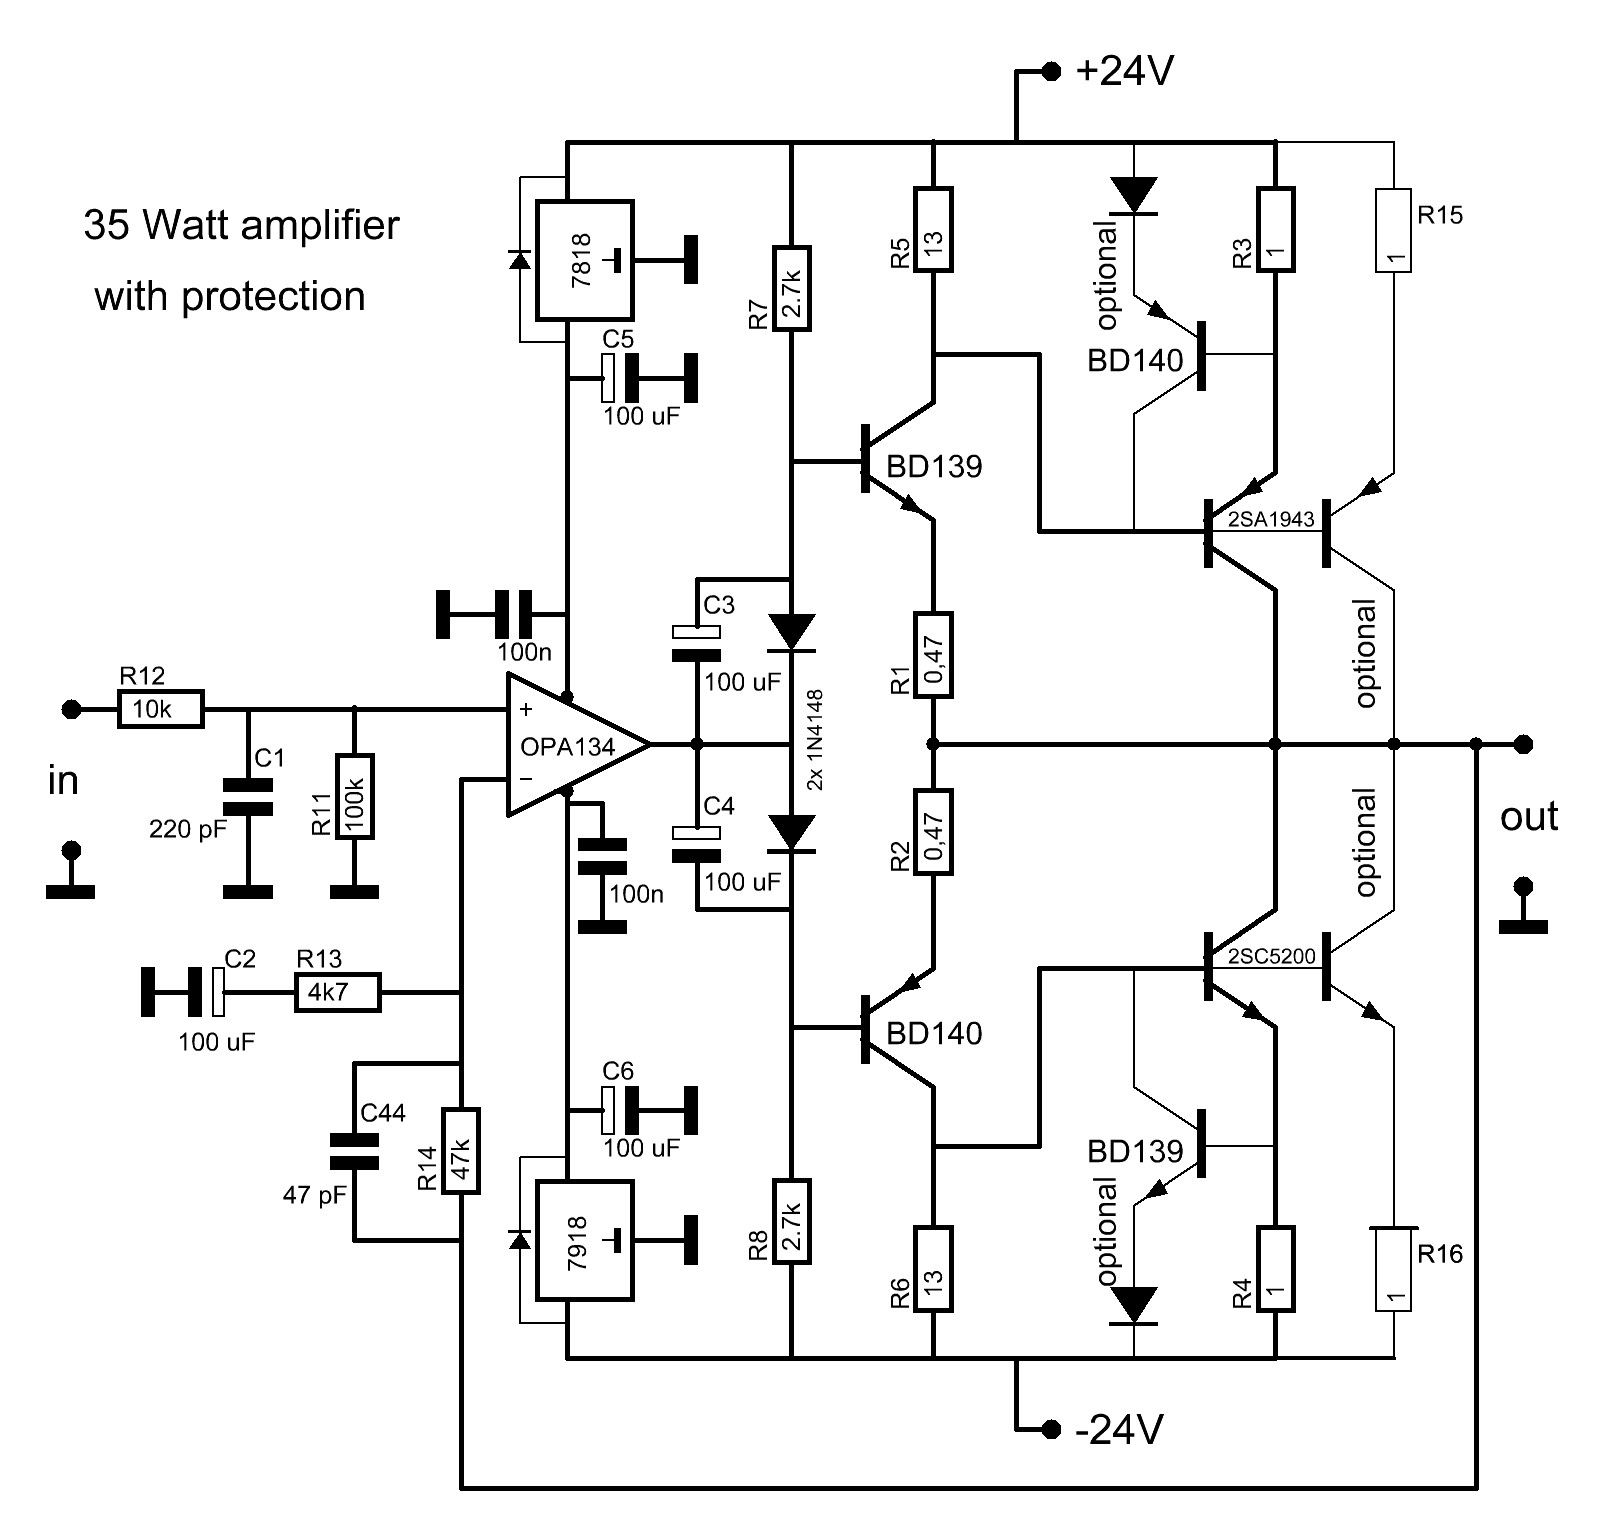 2sc5200 2sa1943 Amplifier Circuit Diagram Circuit Diagram Images Audio Amplifier Circuit Diagram Amplifier